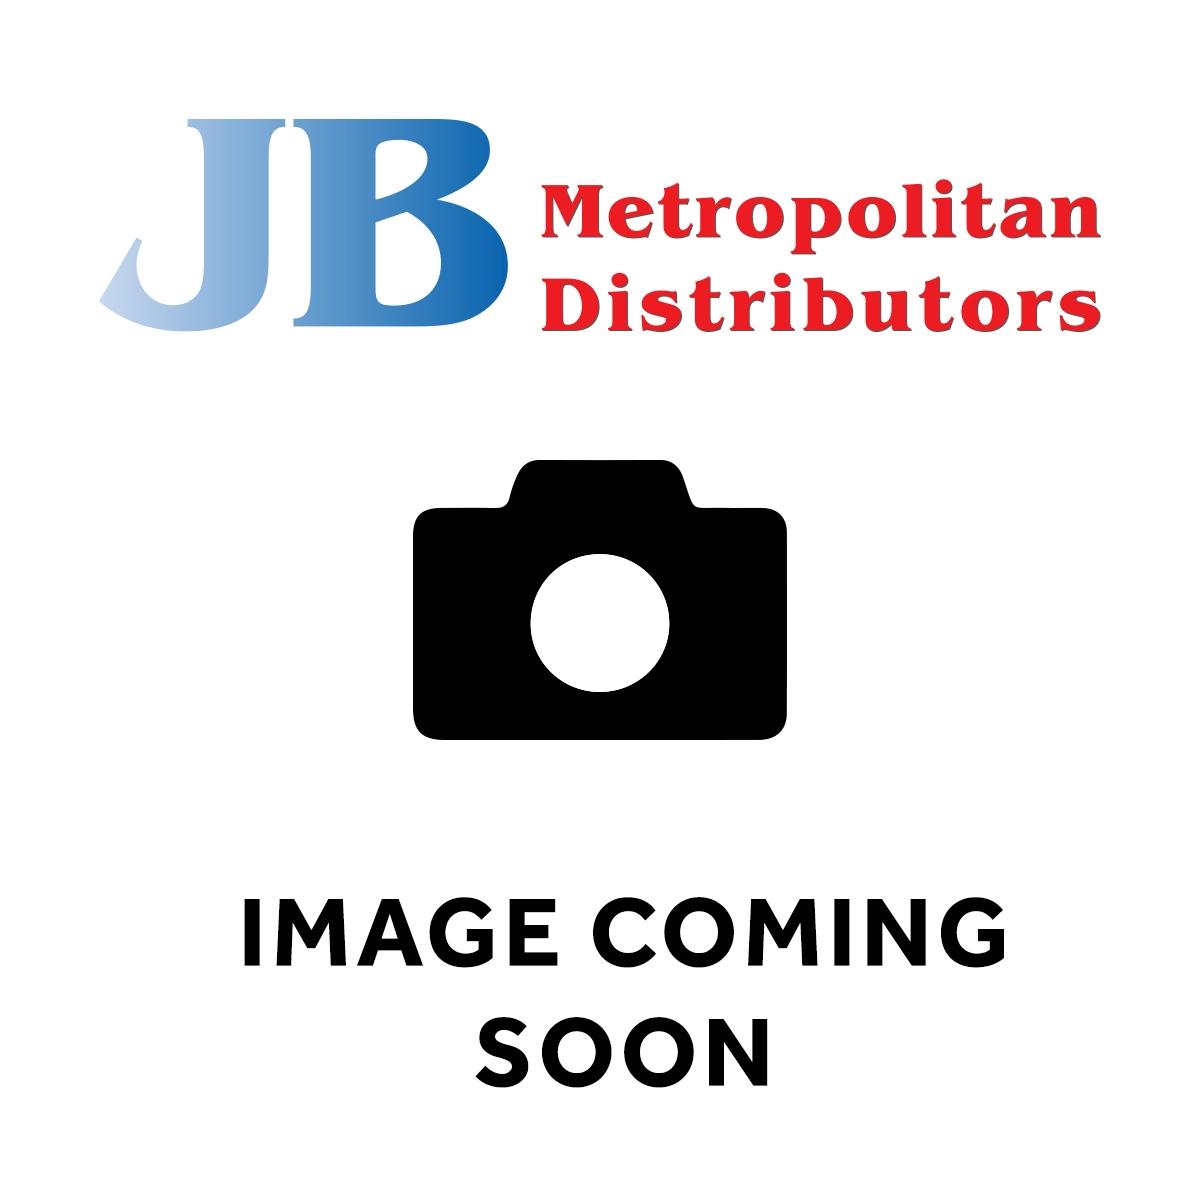 175G NATURAL CHIP HONEY SOY CHICKEN